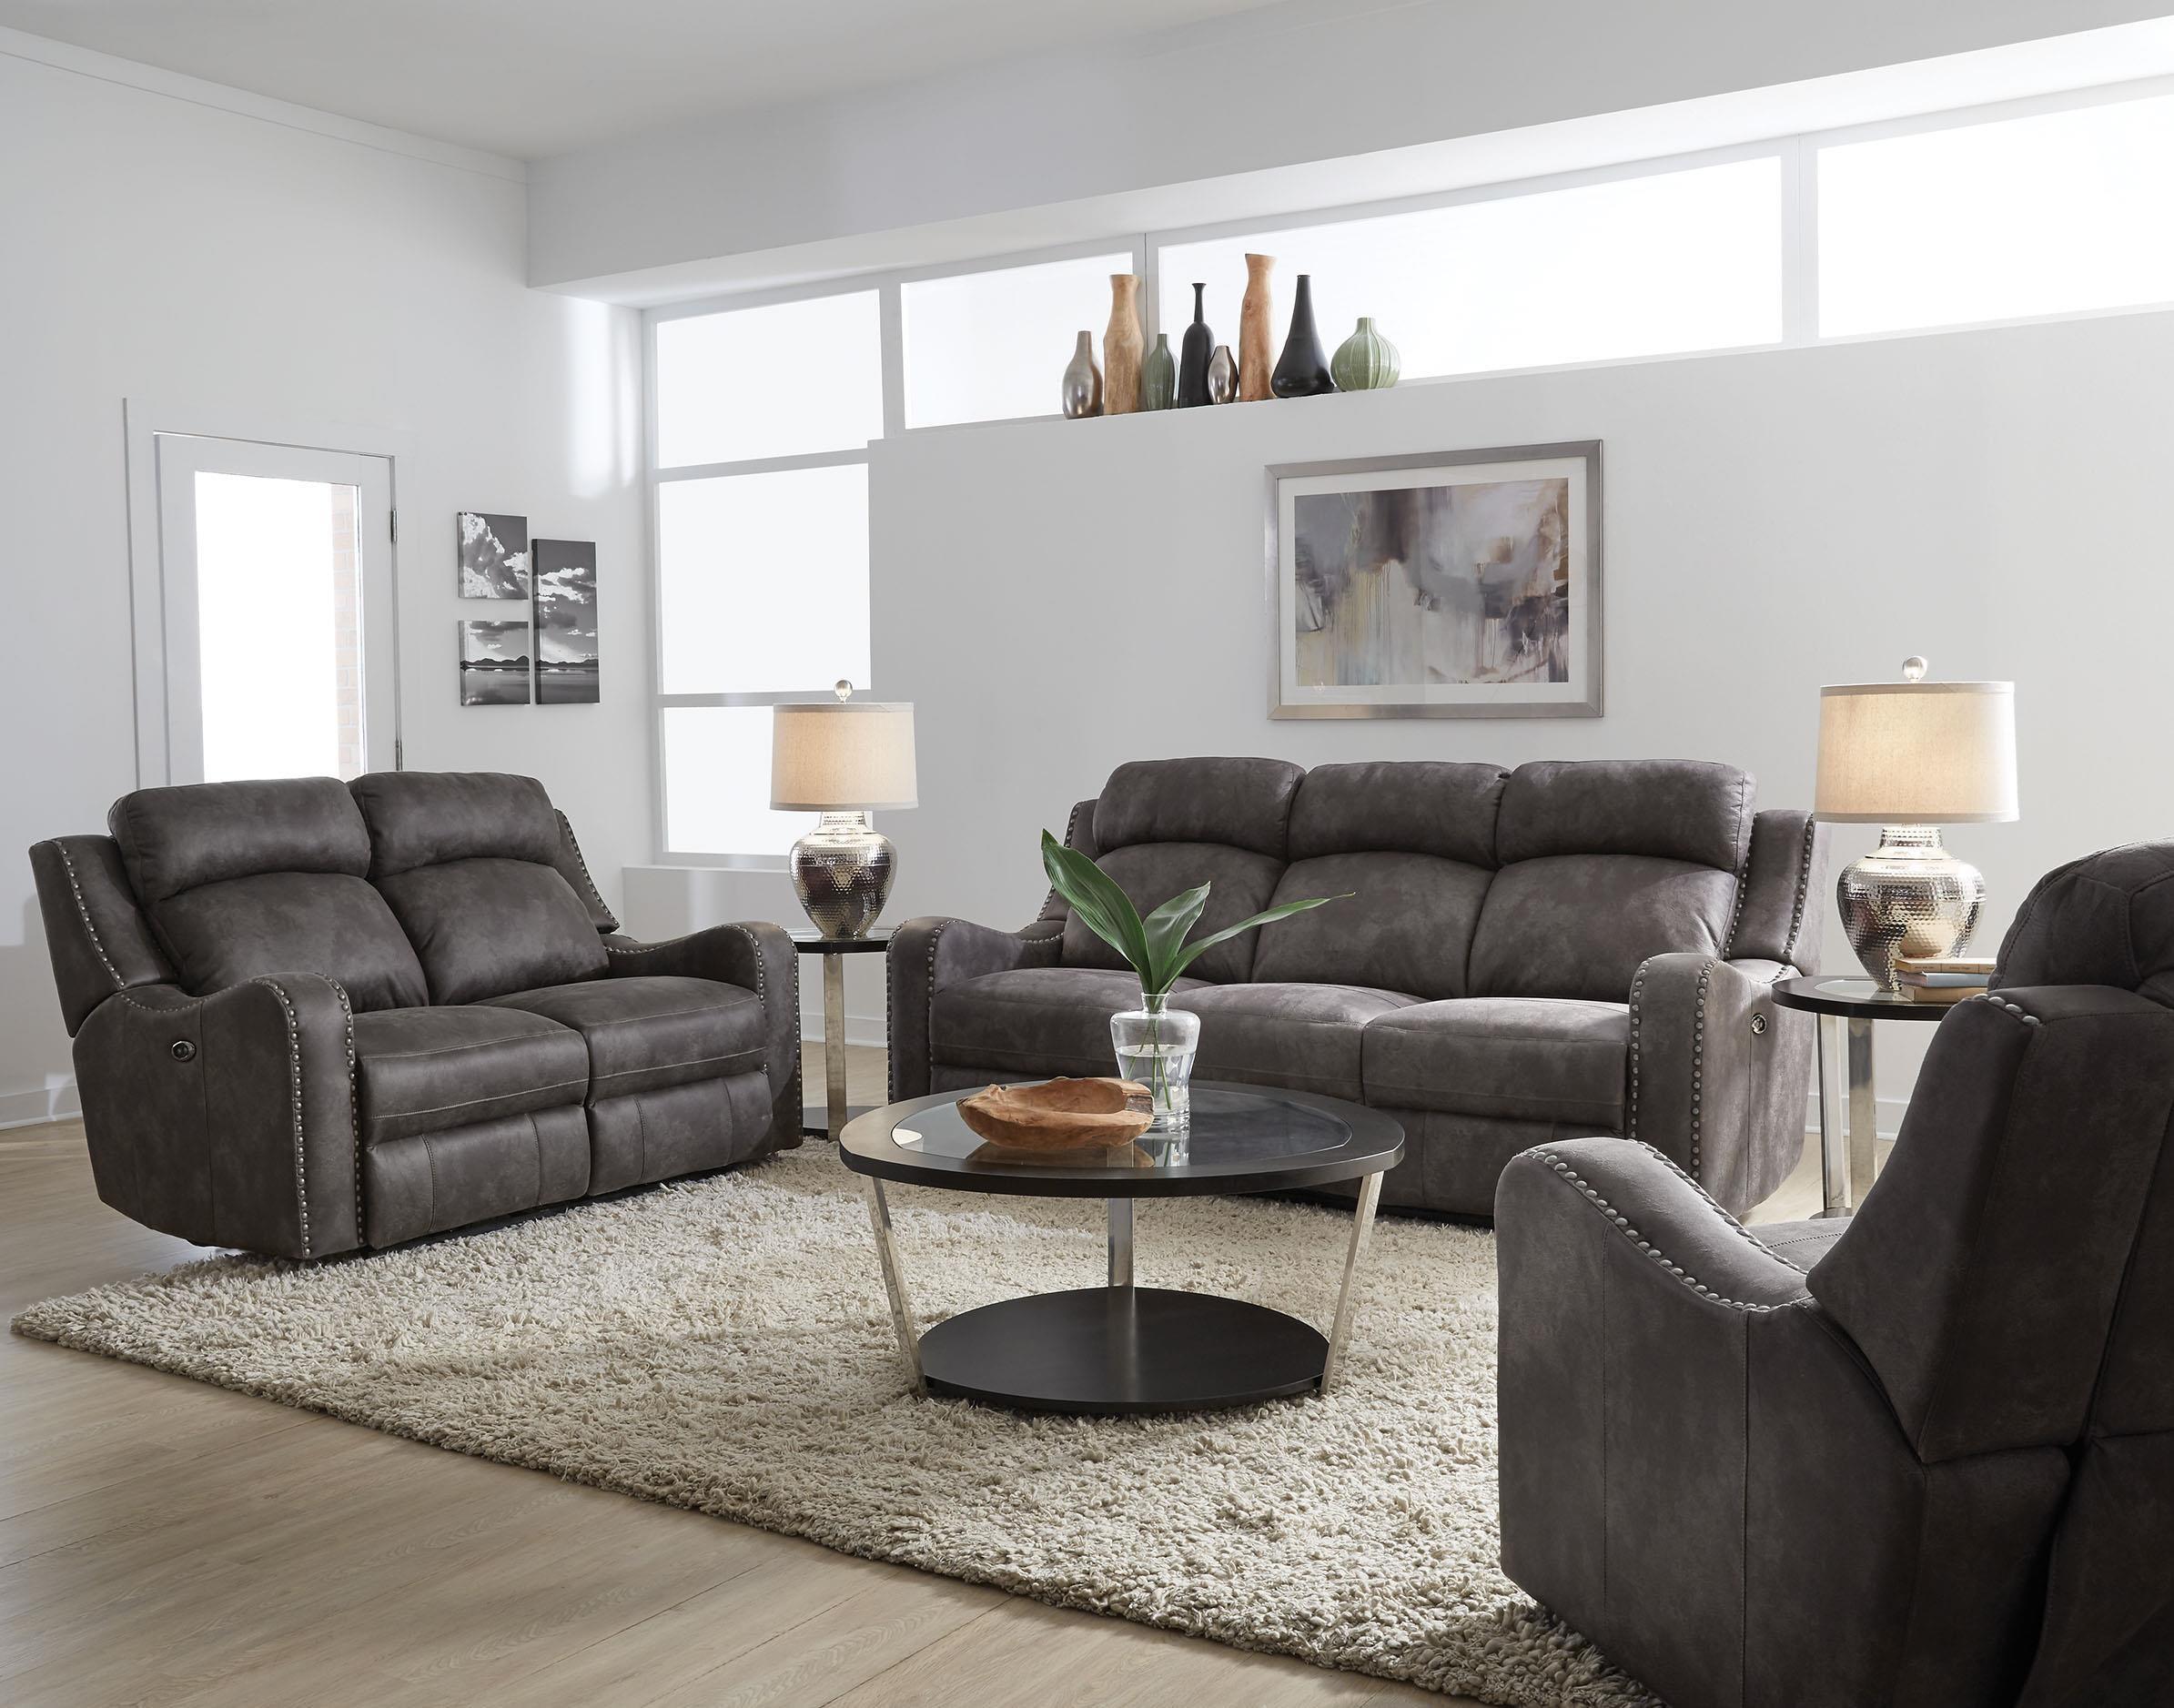 ... Standard Furniture Bankston Grey Reclining Sofa Great American ...